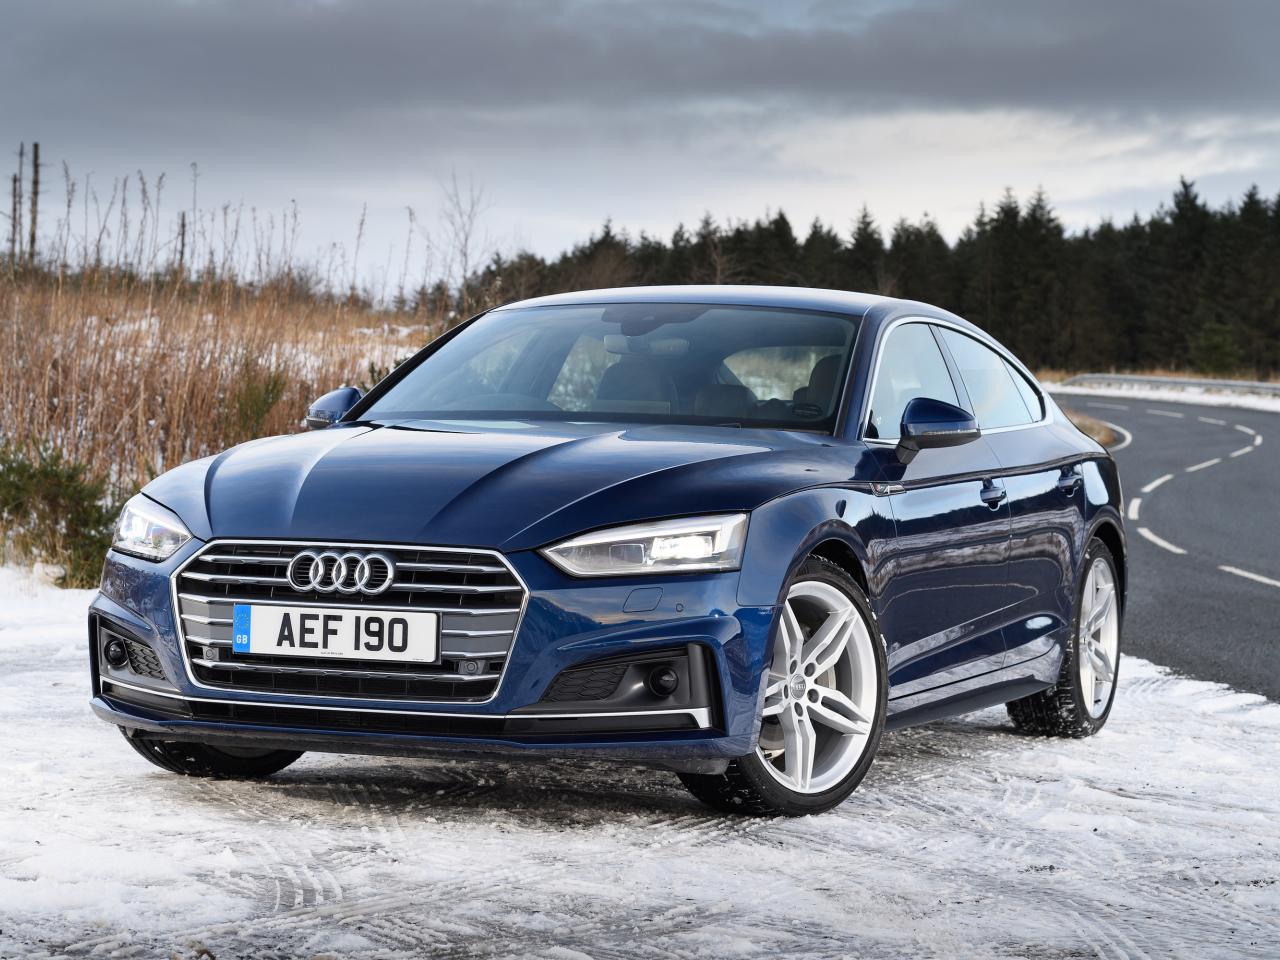 Download 1280x960 Wallpaper Luxury Car Audi A5 Standard 4 3